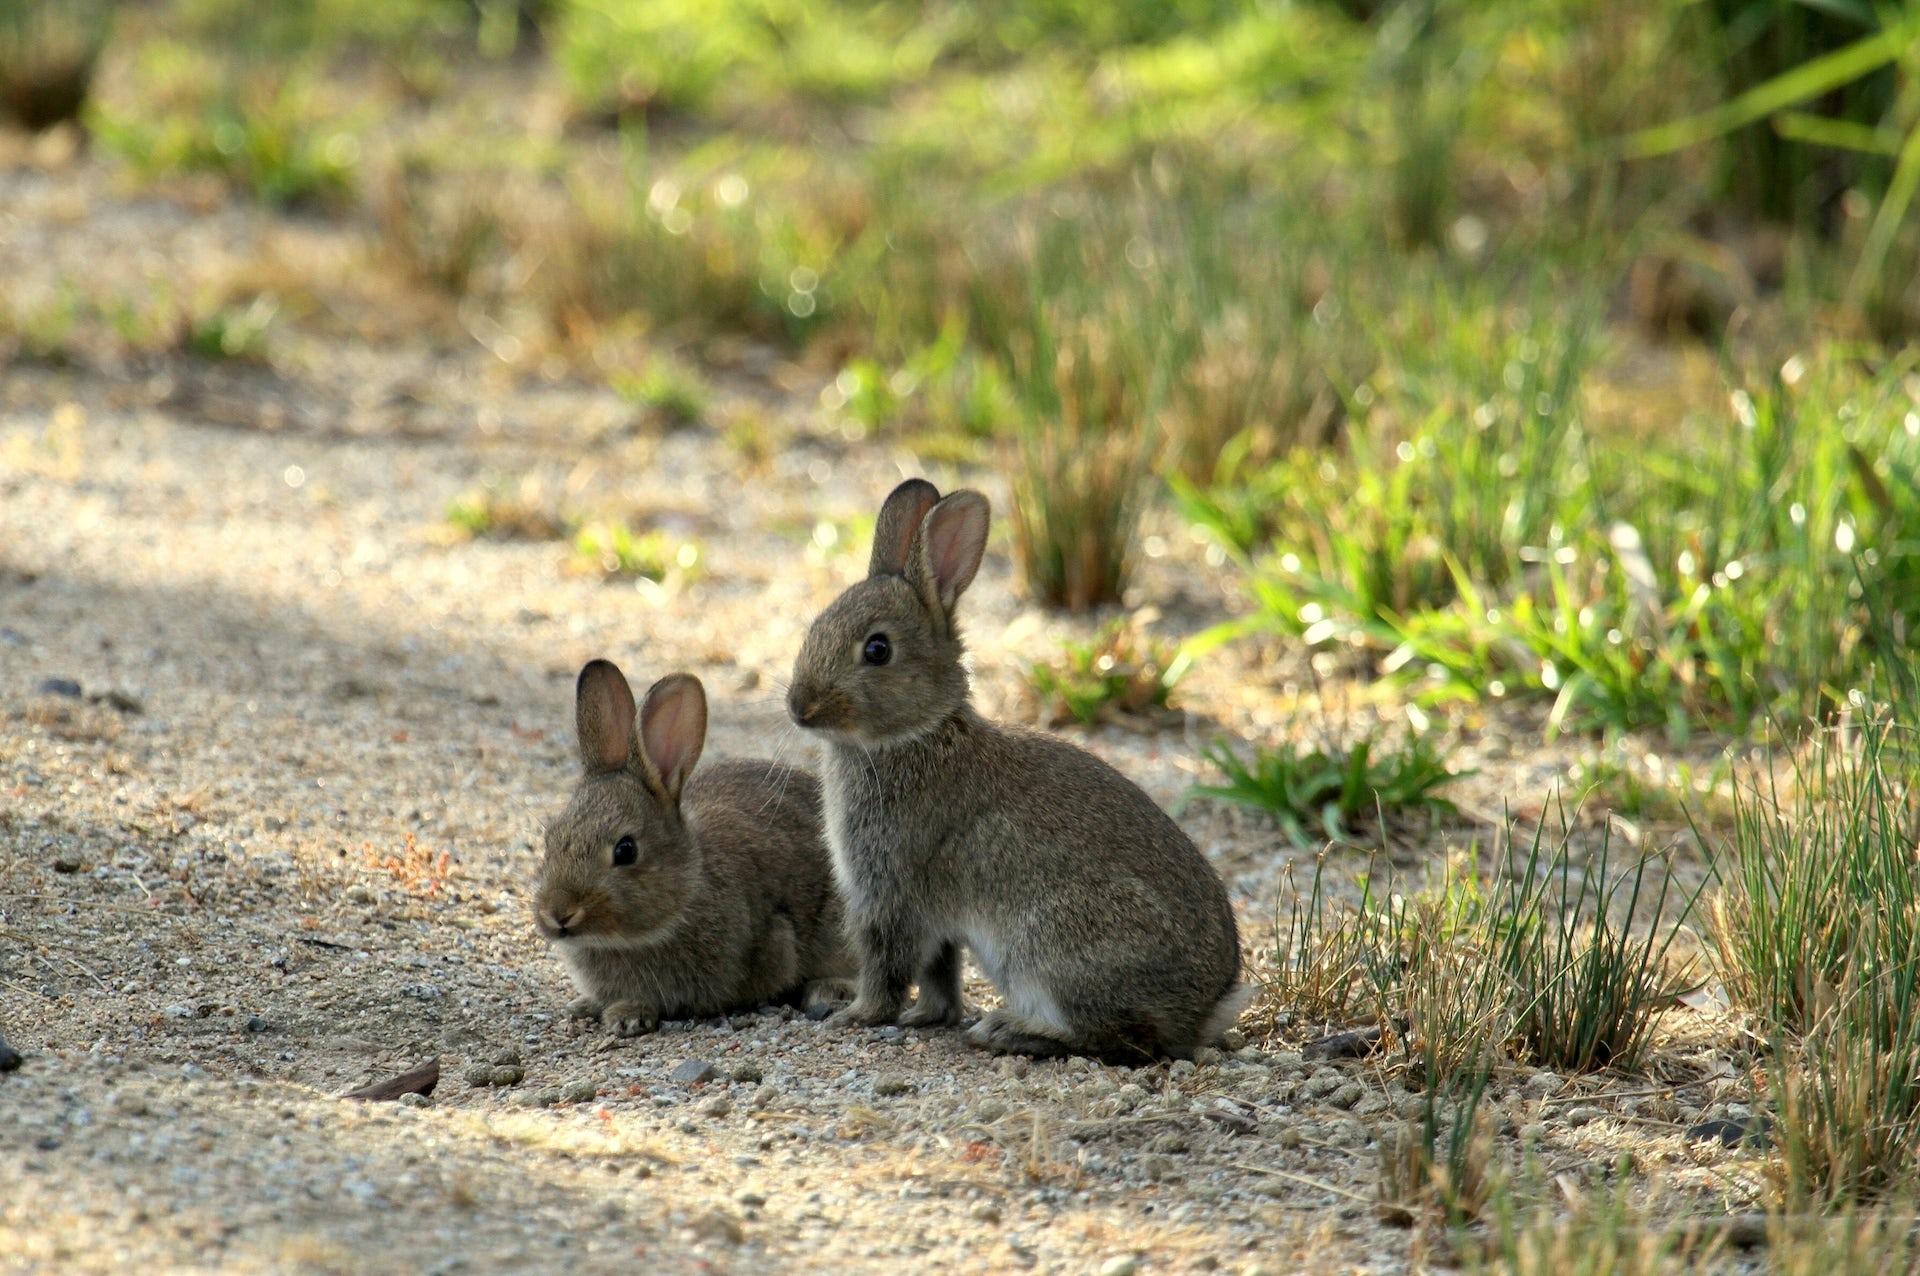 explainer: how 'biocontrol' fights invasive species